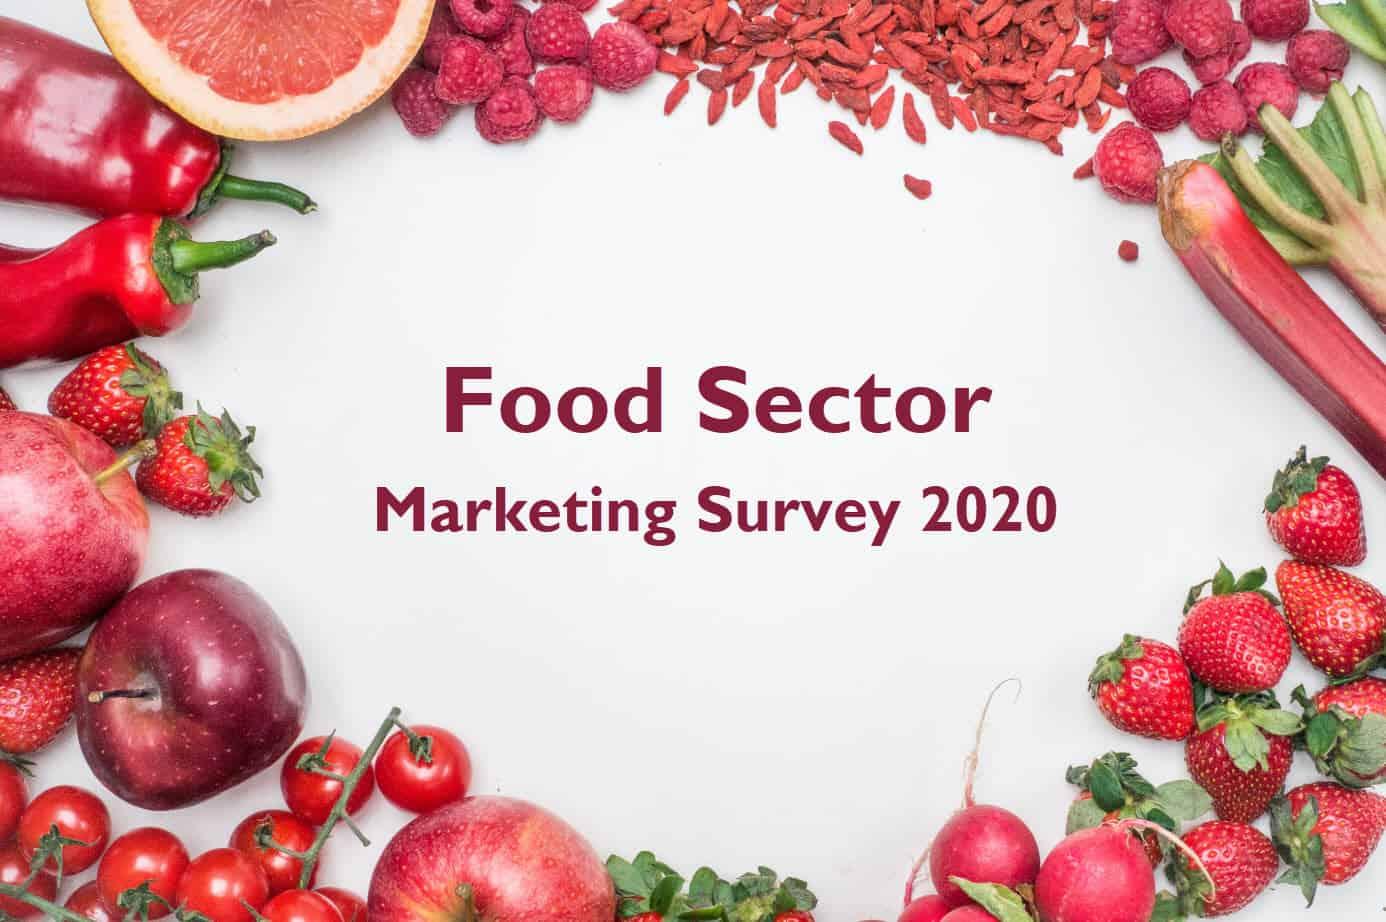 Food Sector Marketing Survey 2020 Vitariss Blue Dolphin